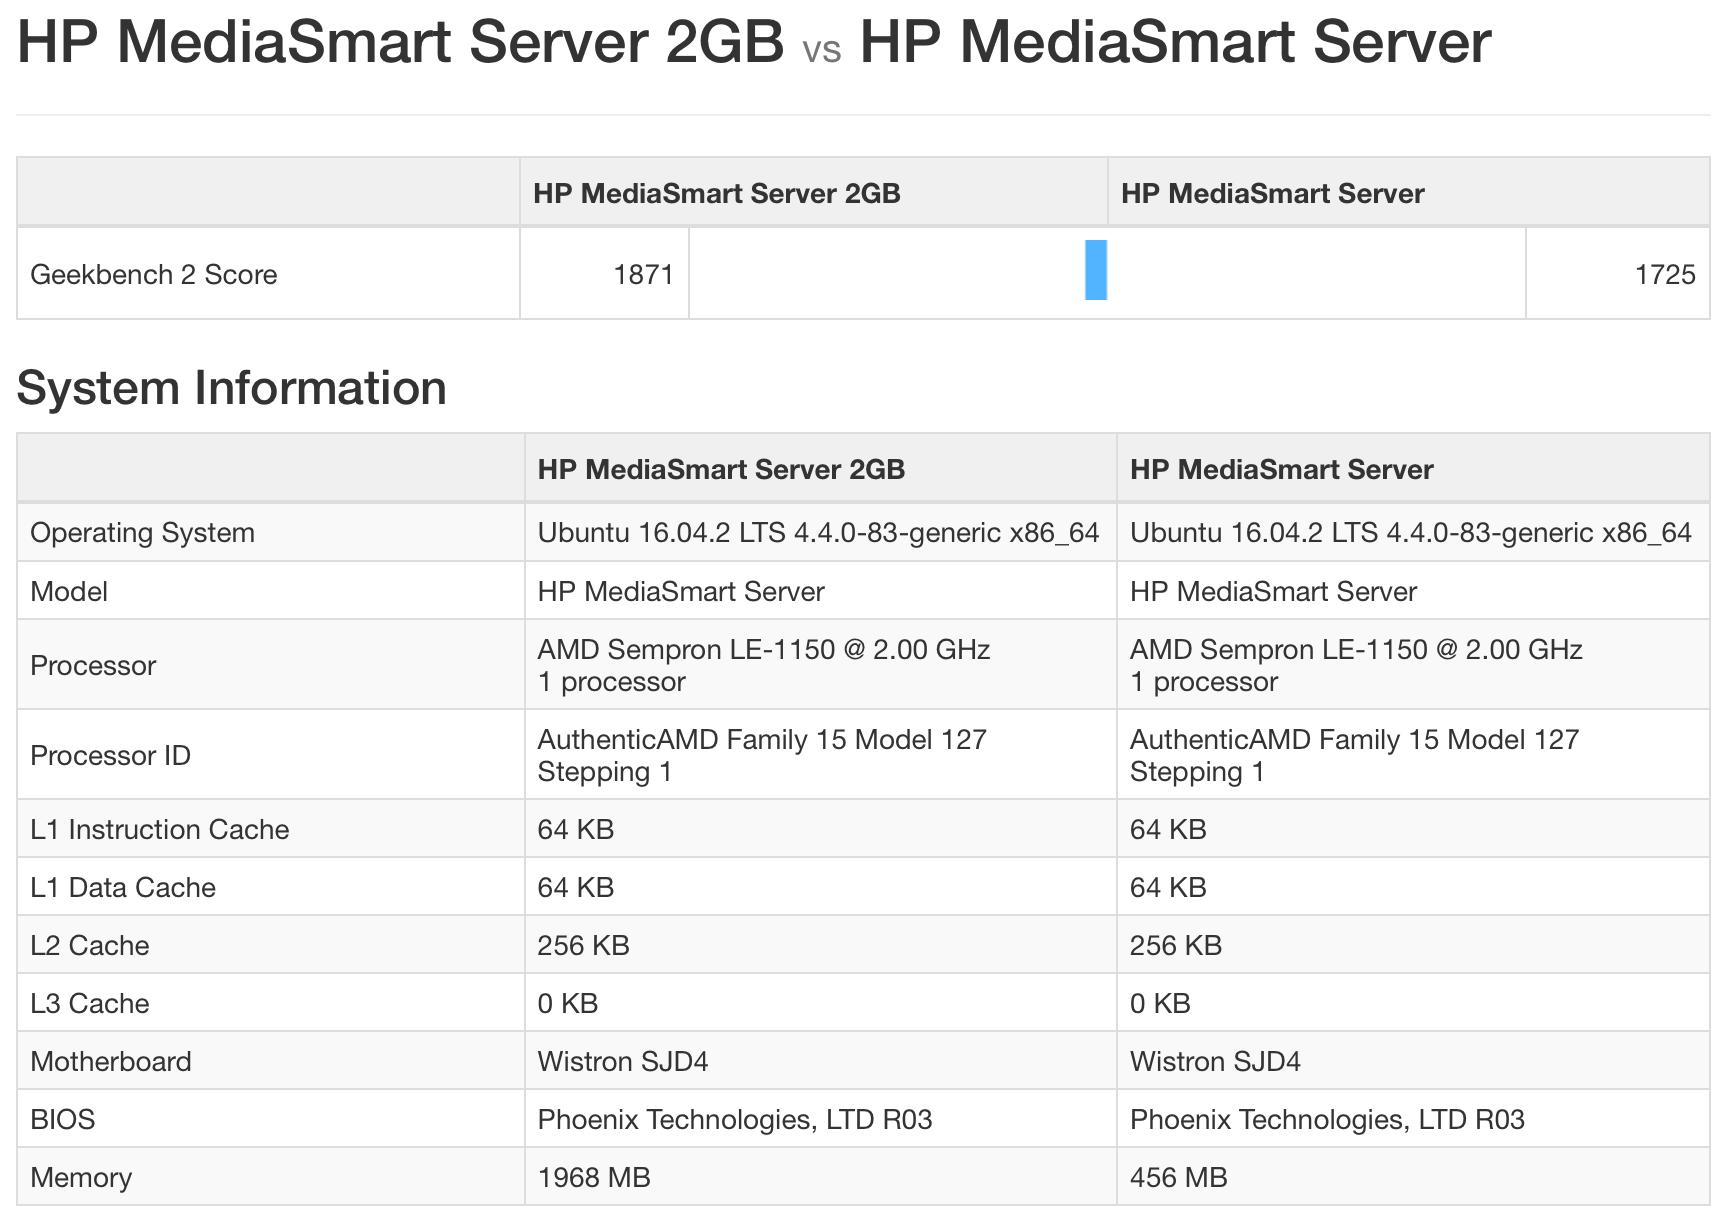 HP MediaSmart Server 2GB vs HP MediaSmart Server - Stephen